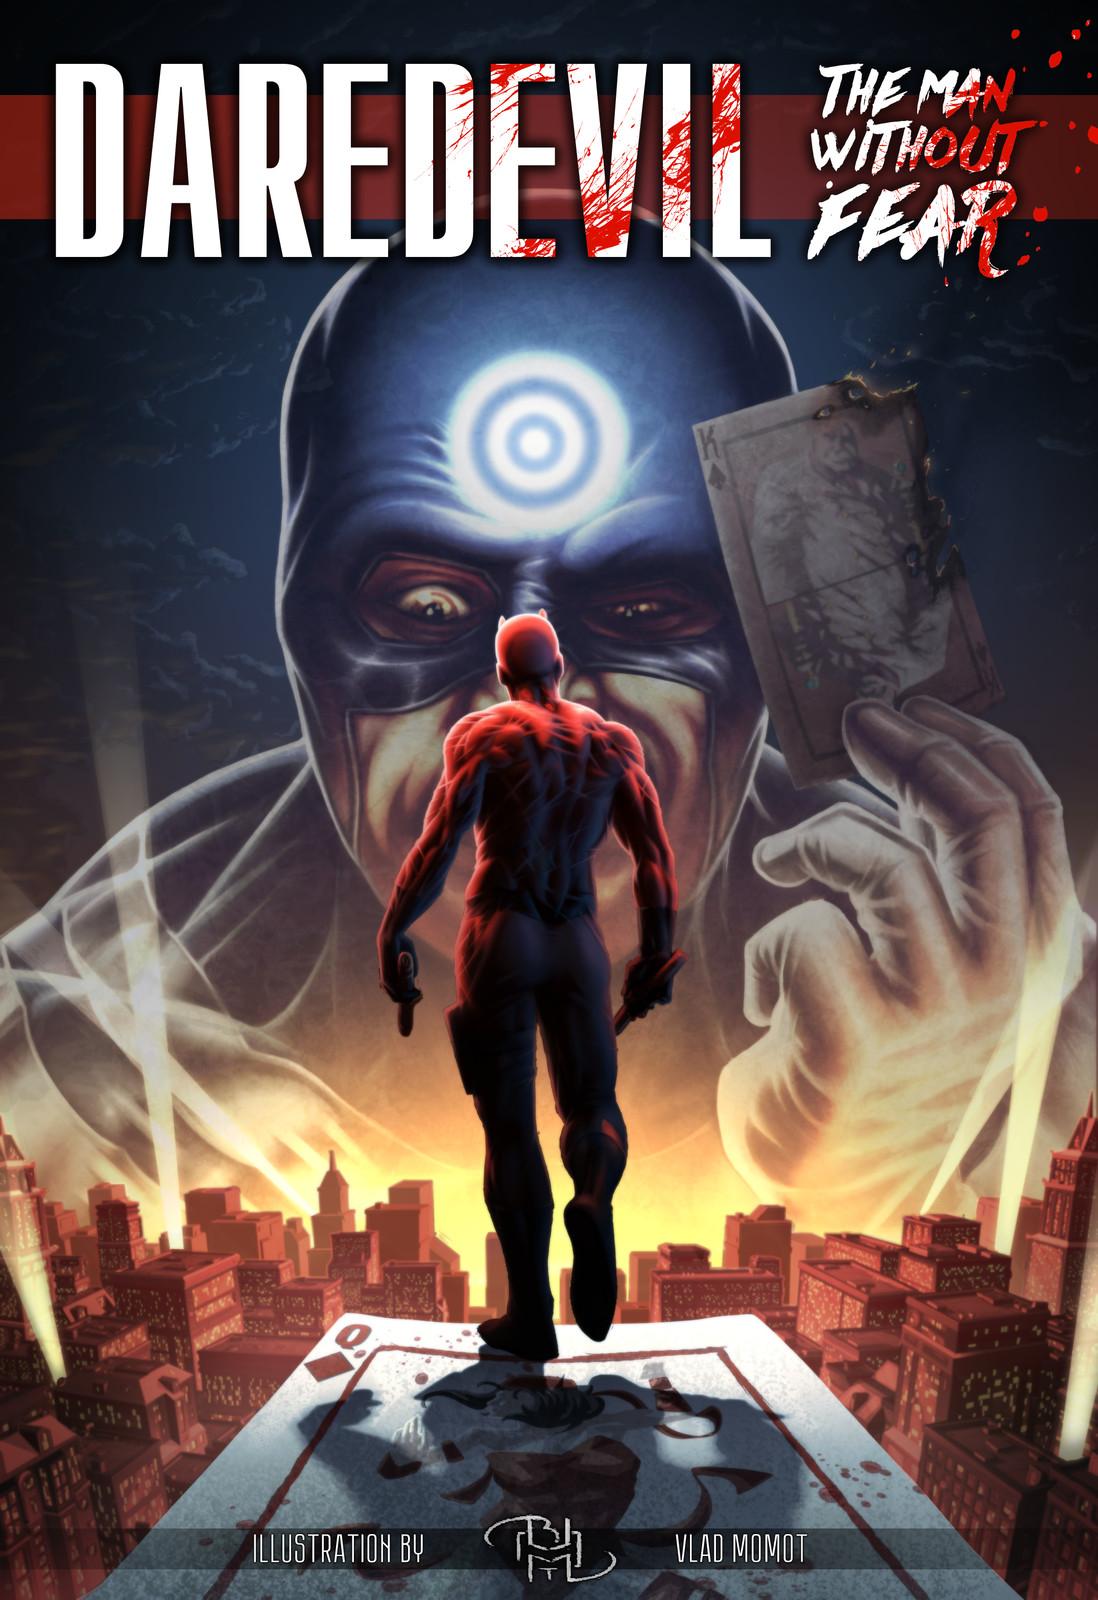 Daredevil: The king of hearts